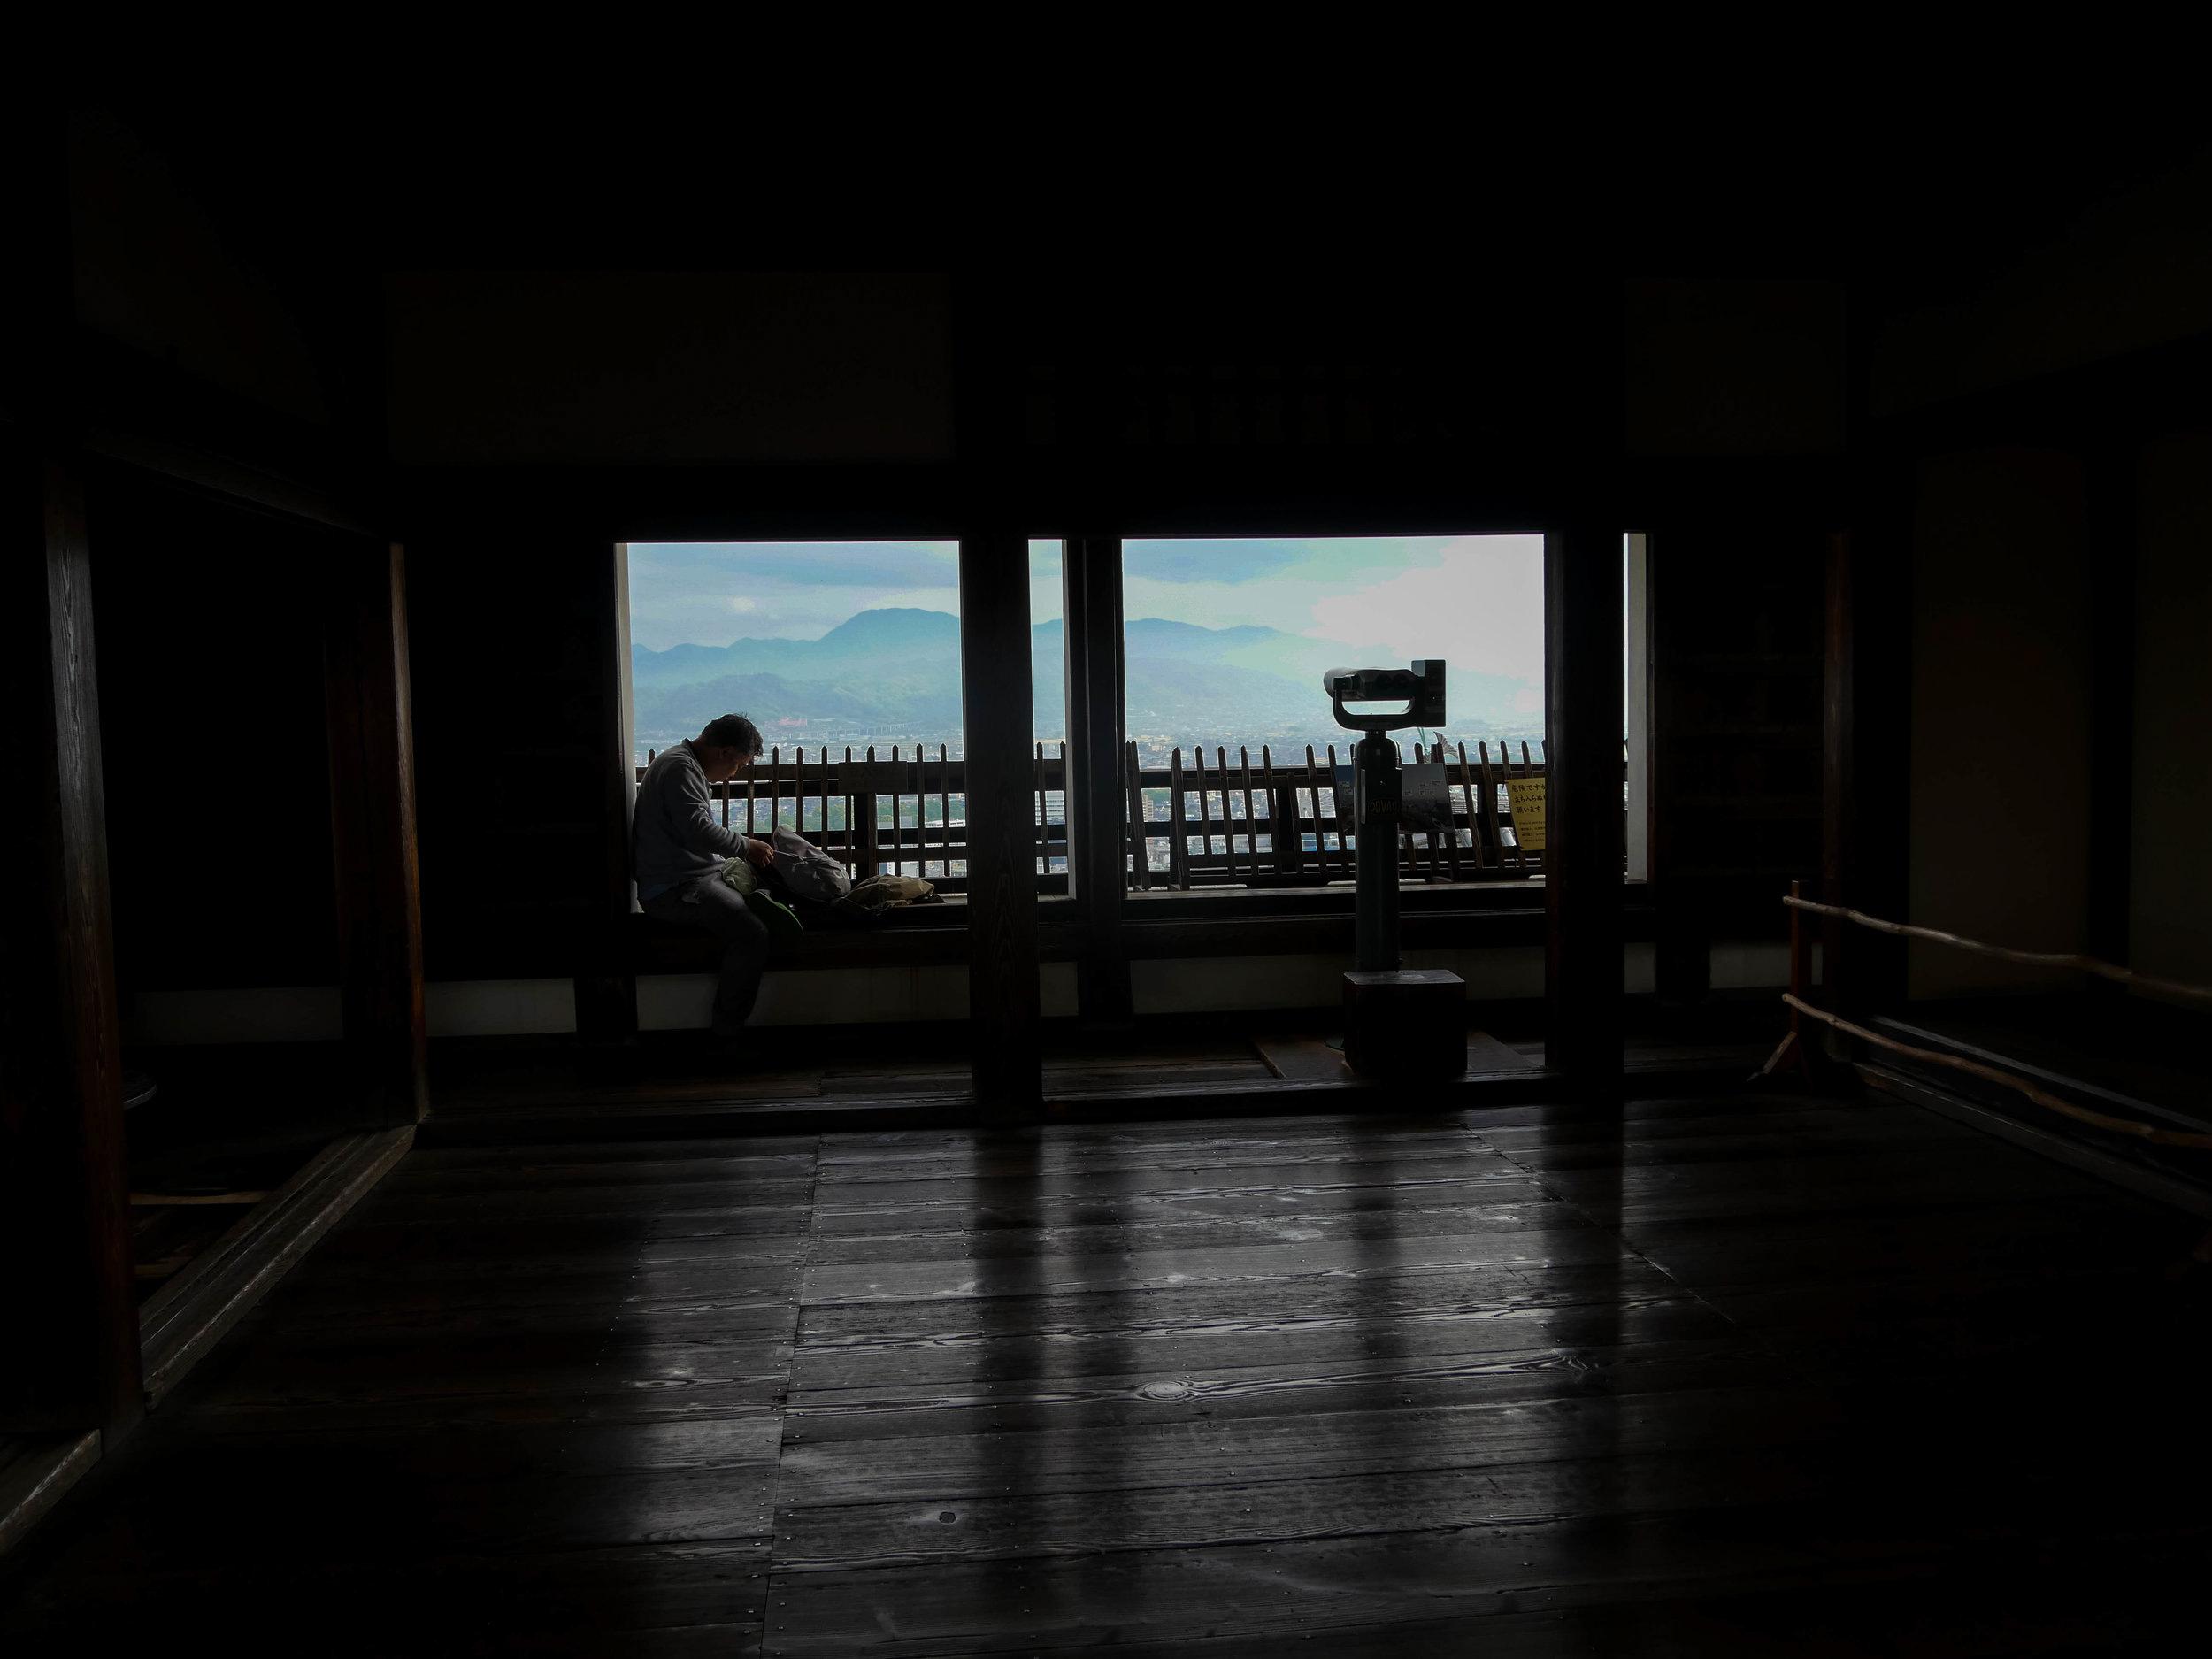 matsuyama-dougo-onsen-17.jpg